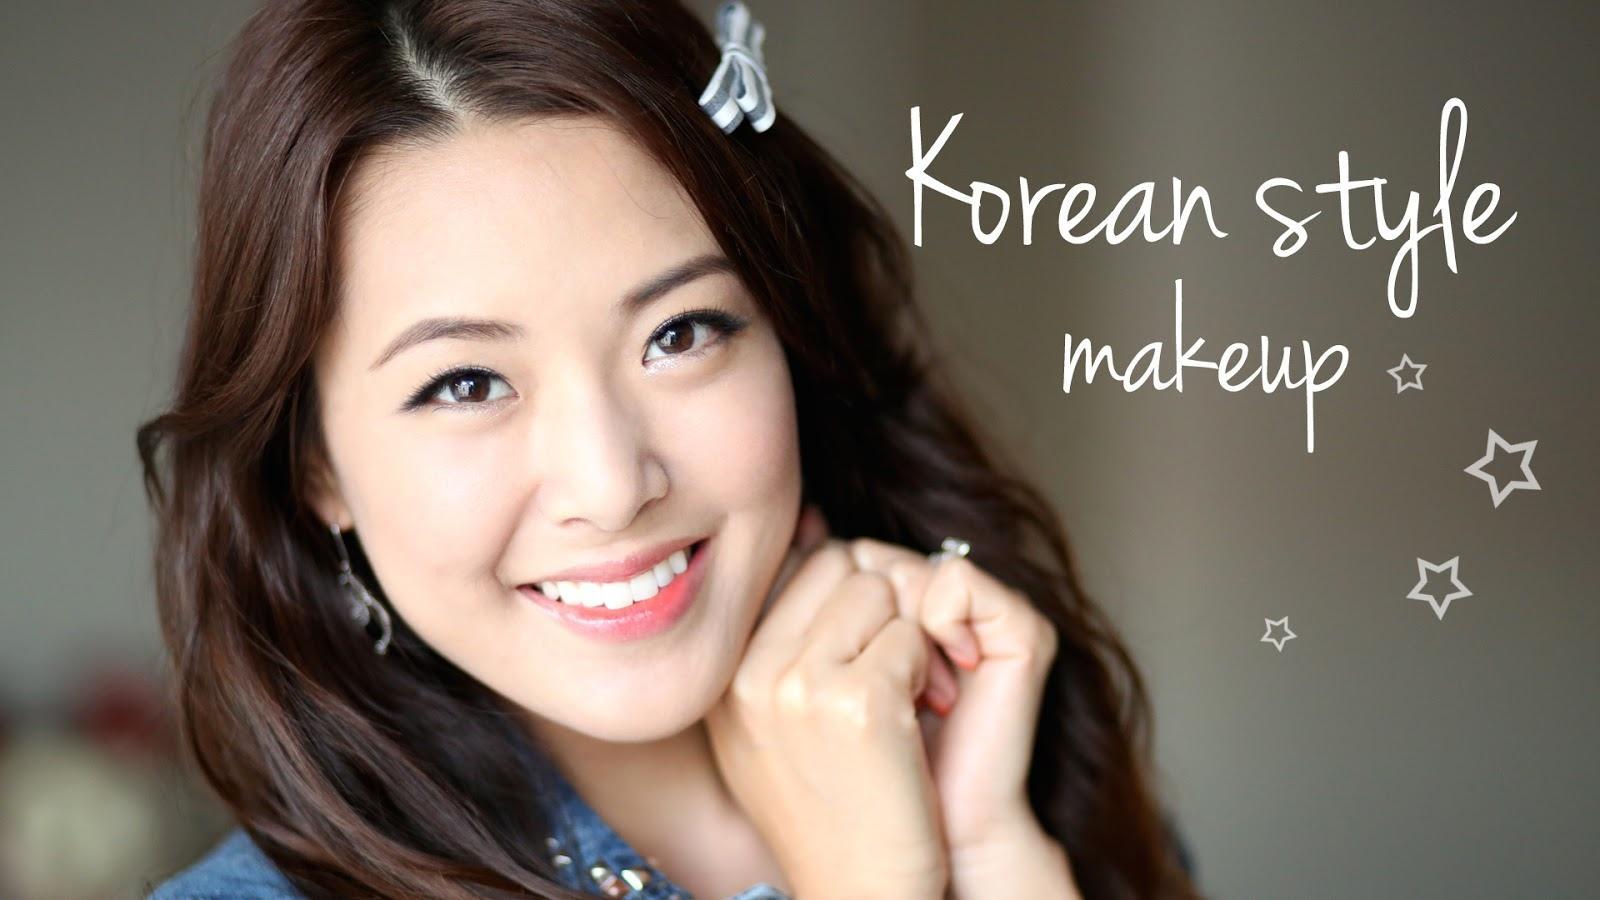 Korean Women Wallpaper Hd Download